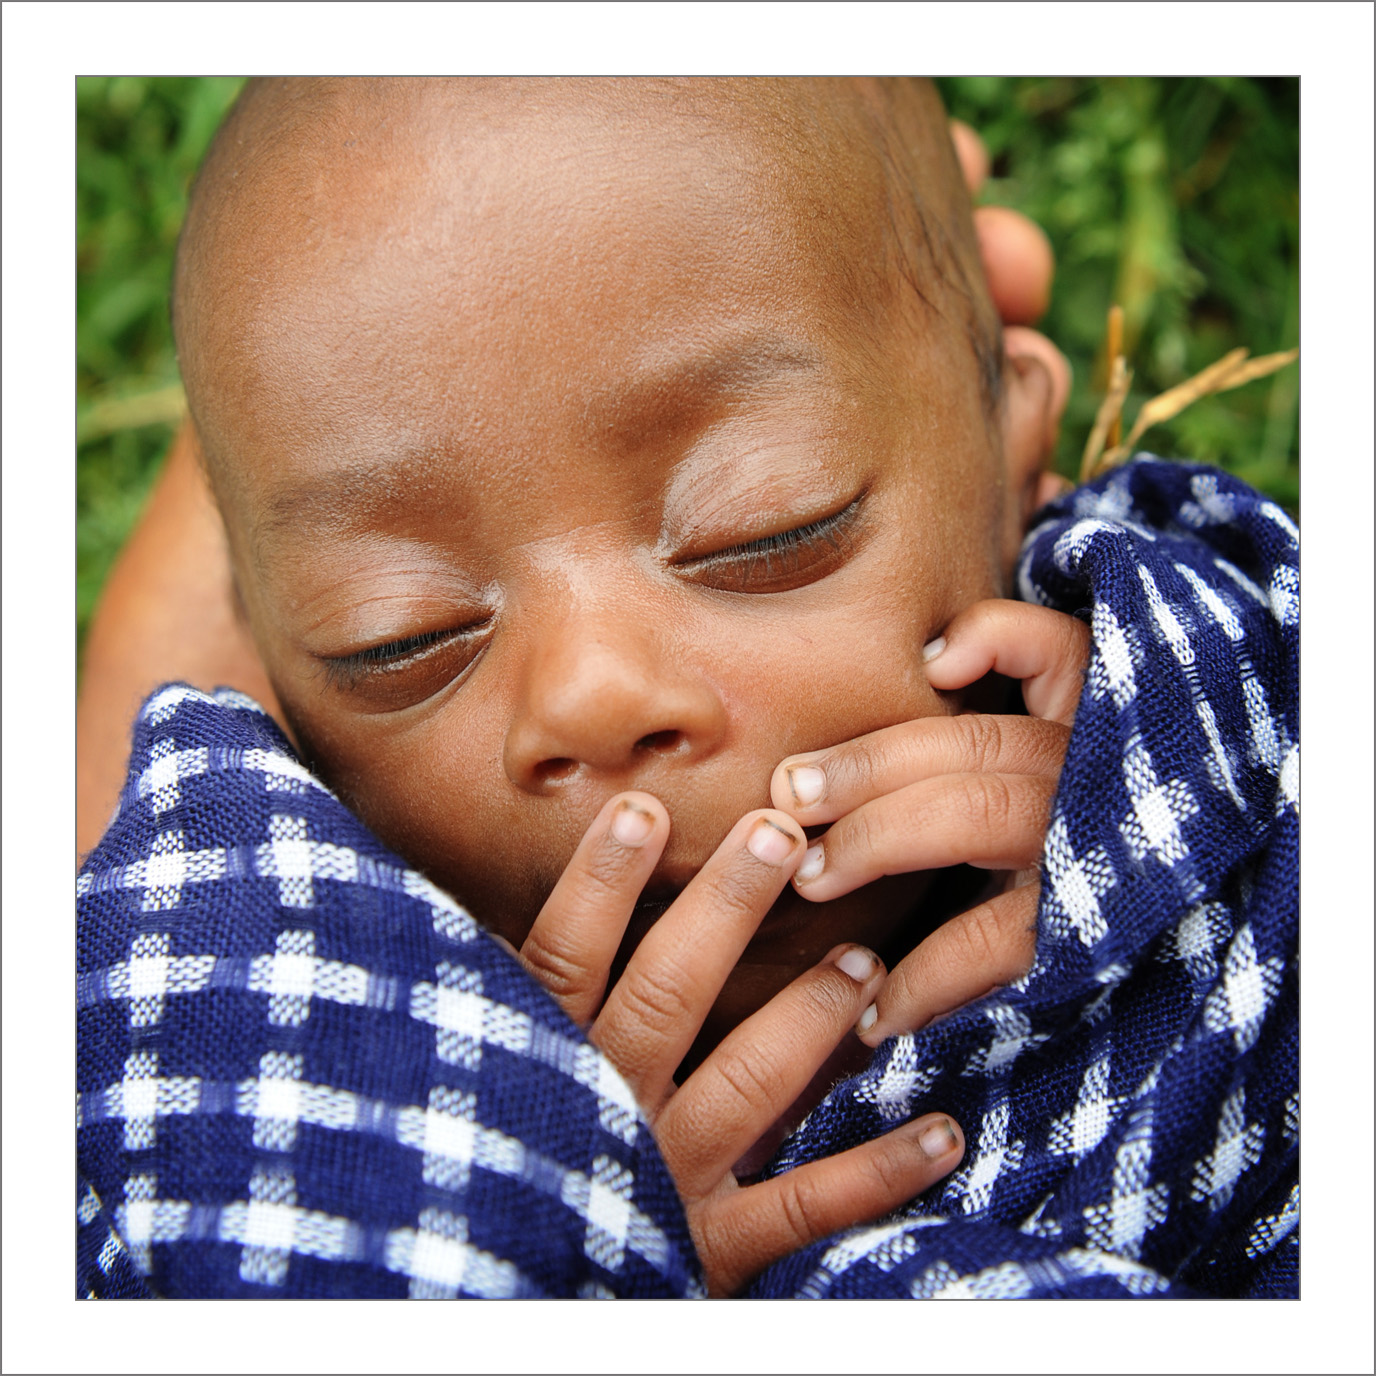 Baby Juddah